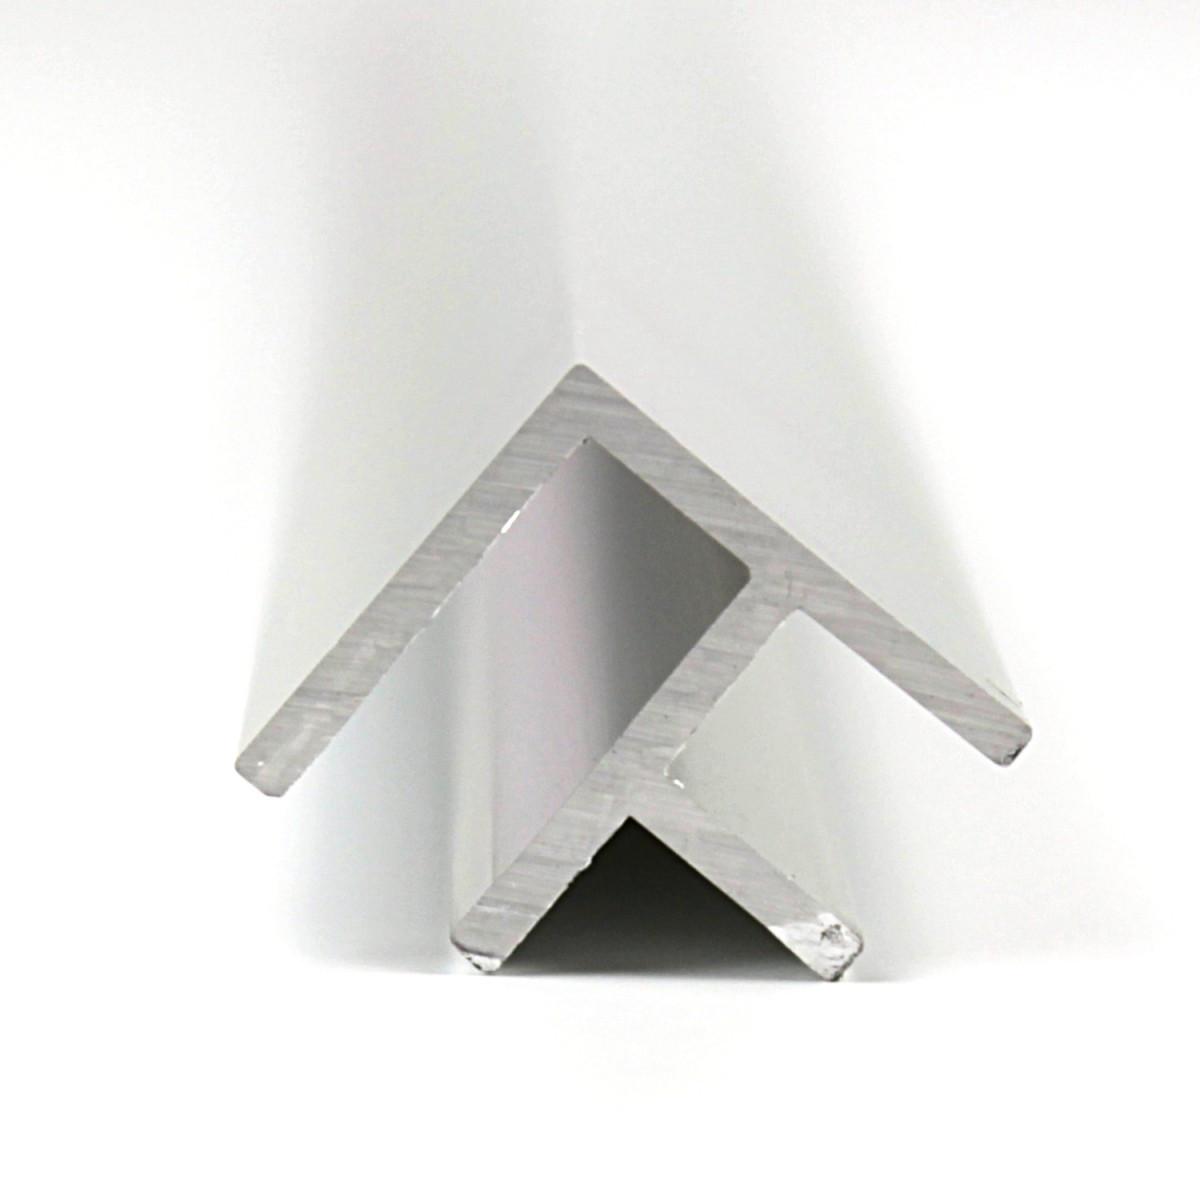 Eckprofil Aluminium, 2010 x 22 x 12 x 20 x 1,5mm, Chromoptik